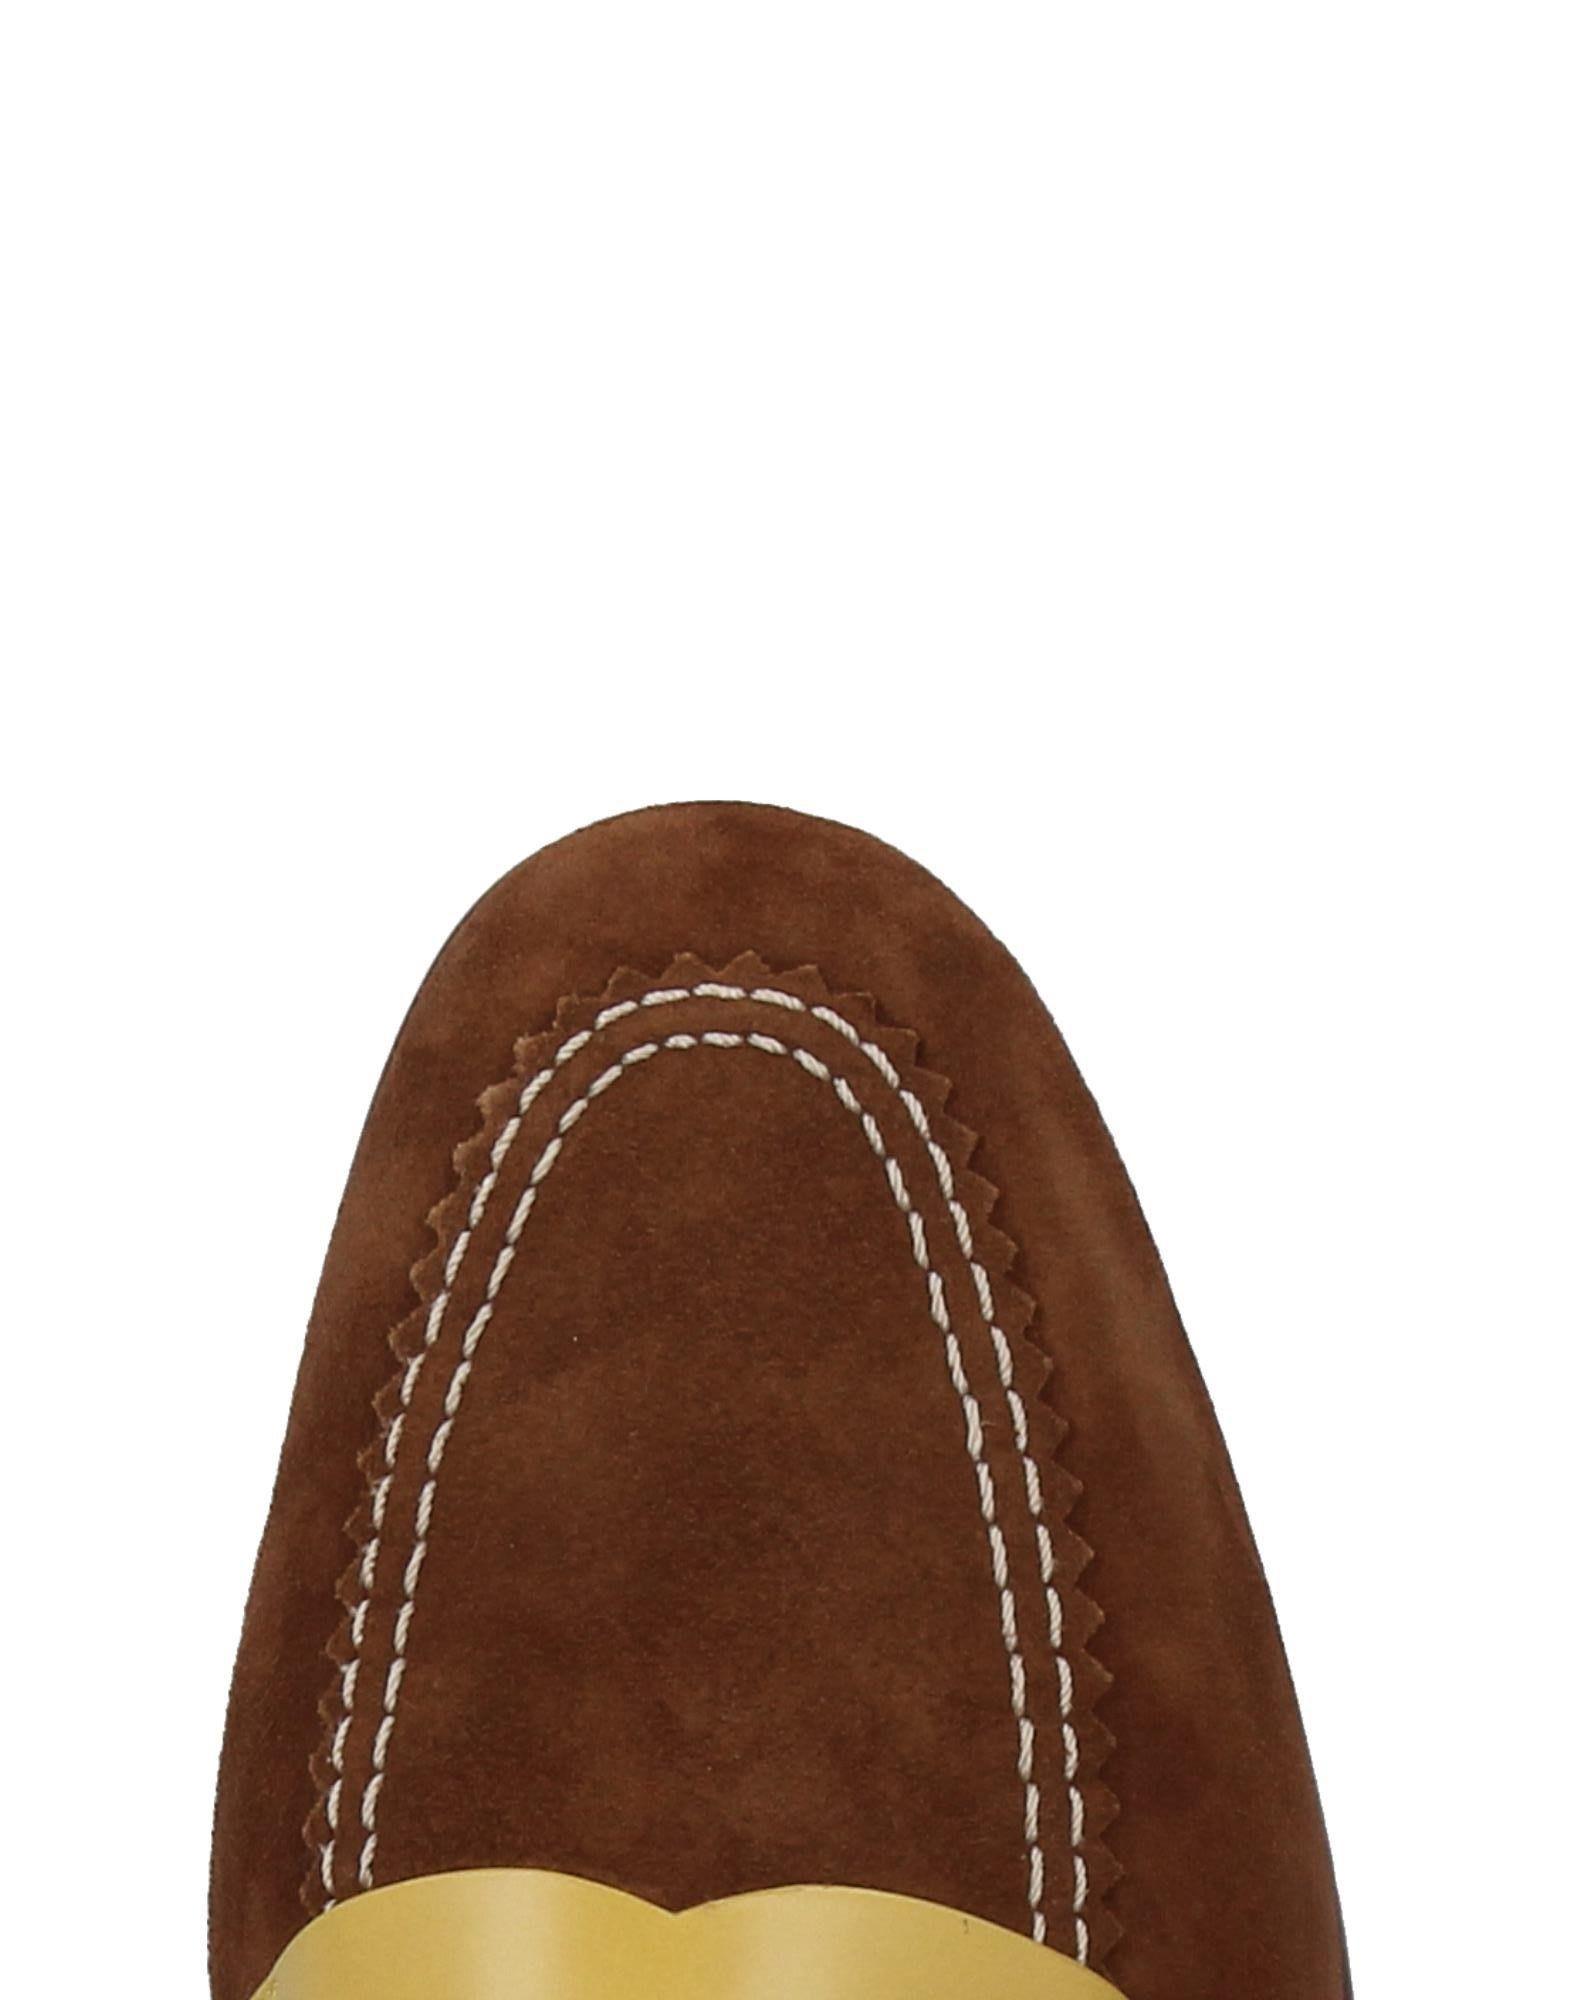 Santoni strapazierfähige Mokassins Damen  11389996BXGut aussehende strapazierfähige Santoni Schuhe dd0c2c